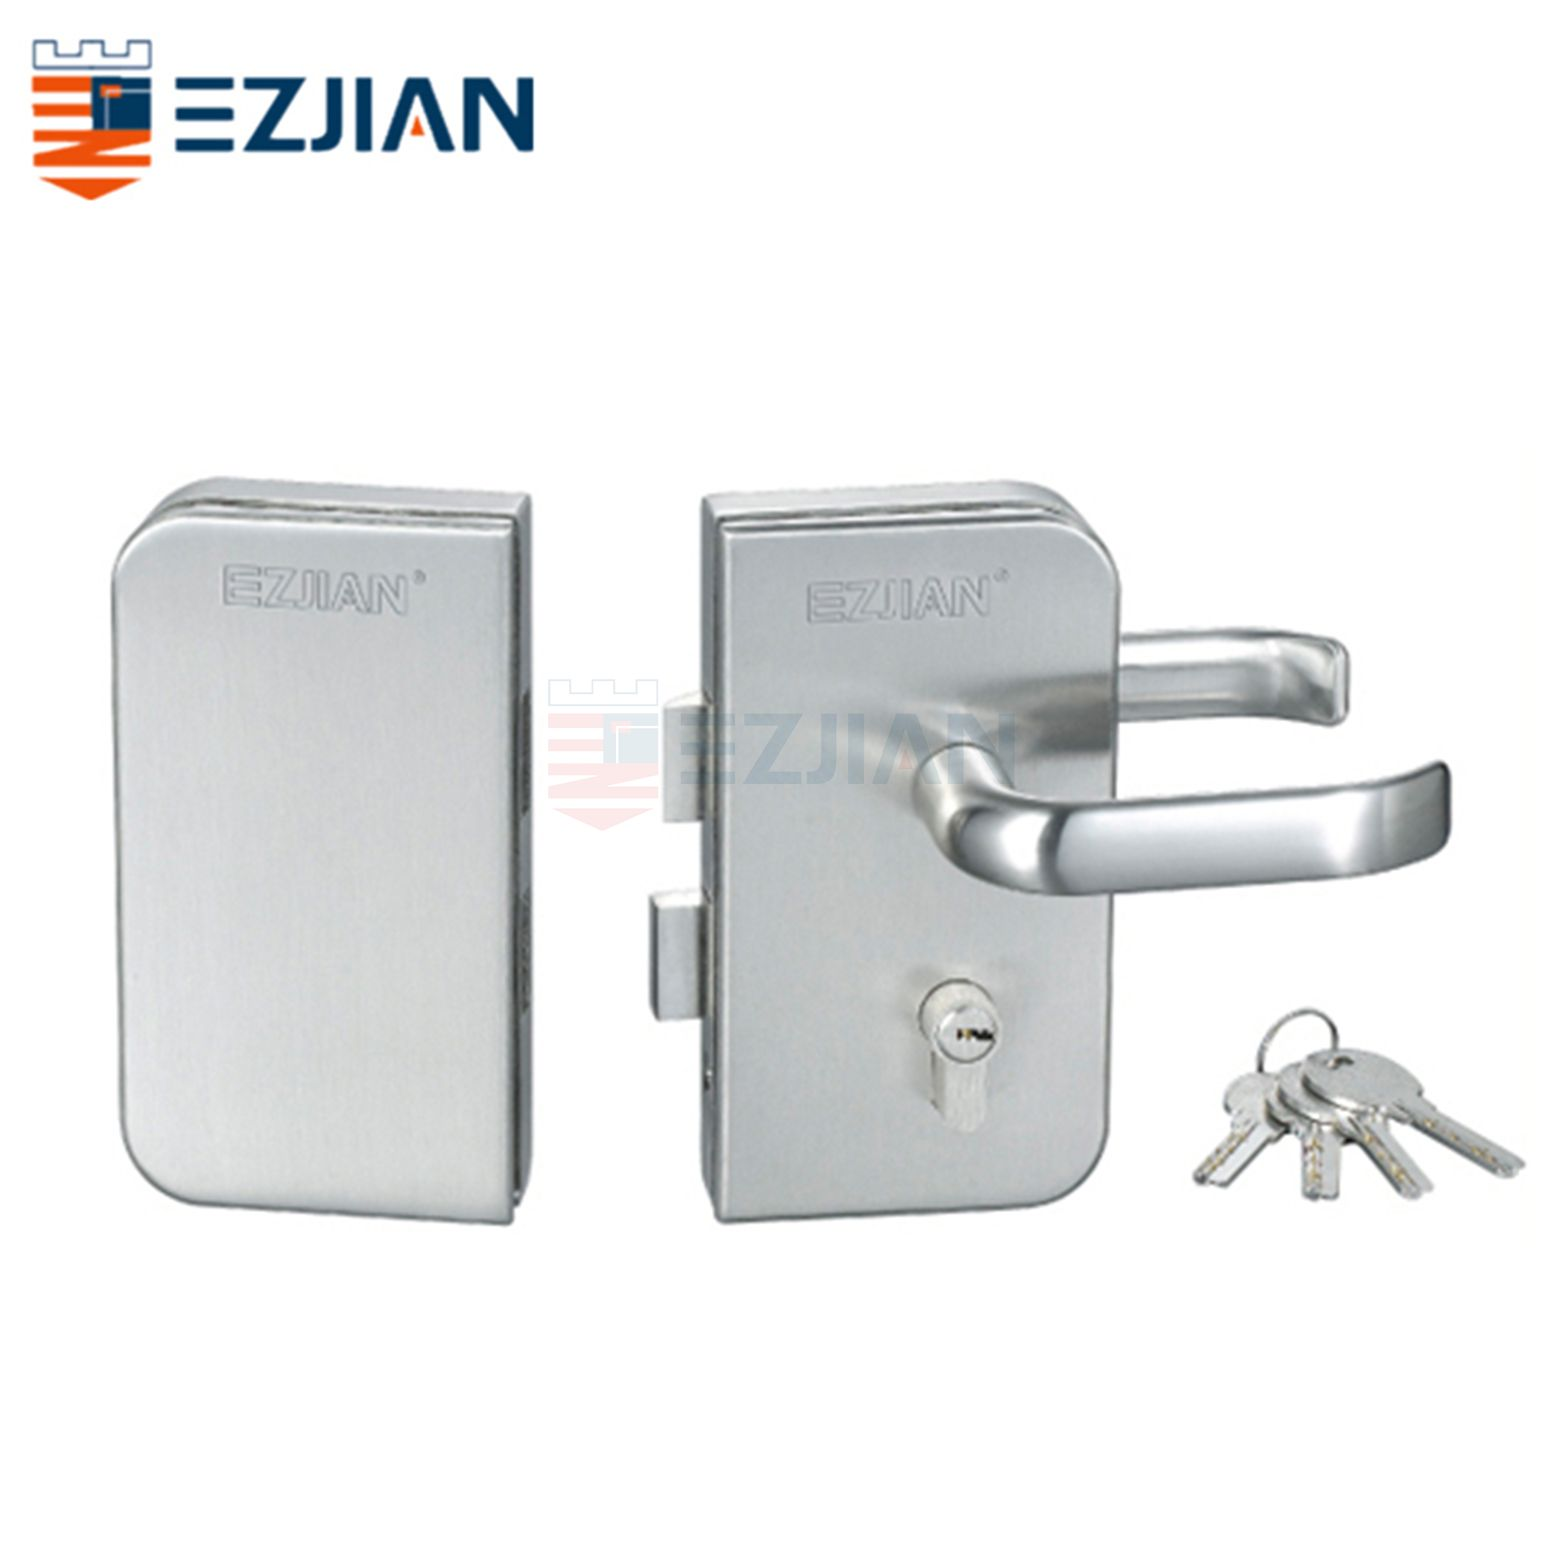 Glass Gate Lock EJ-9001